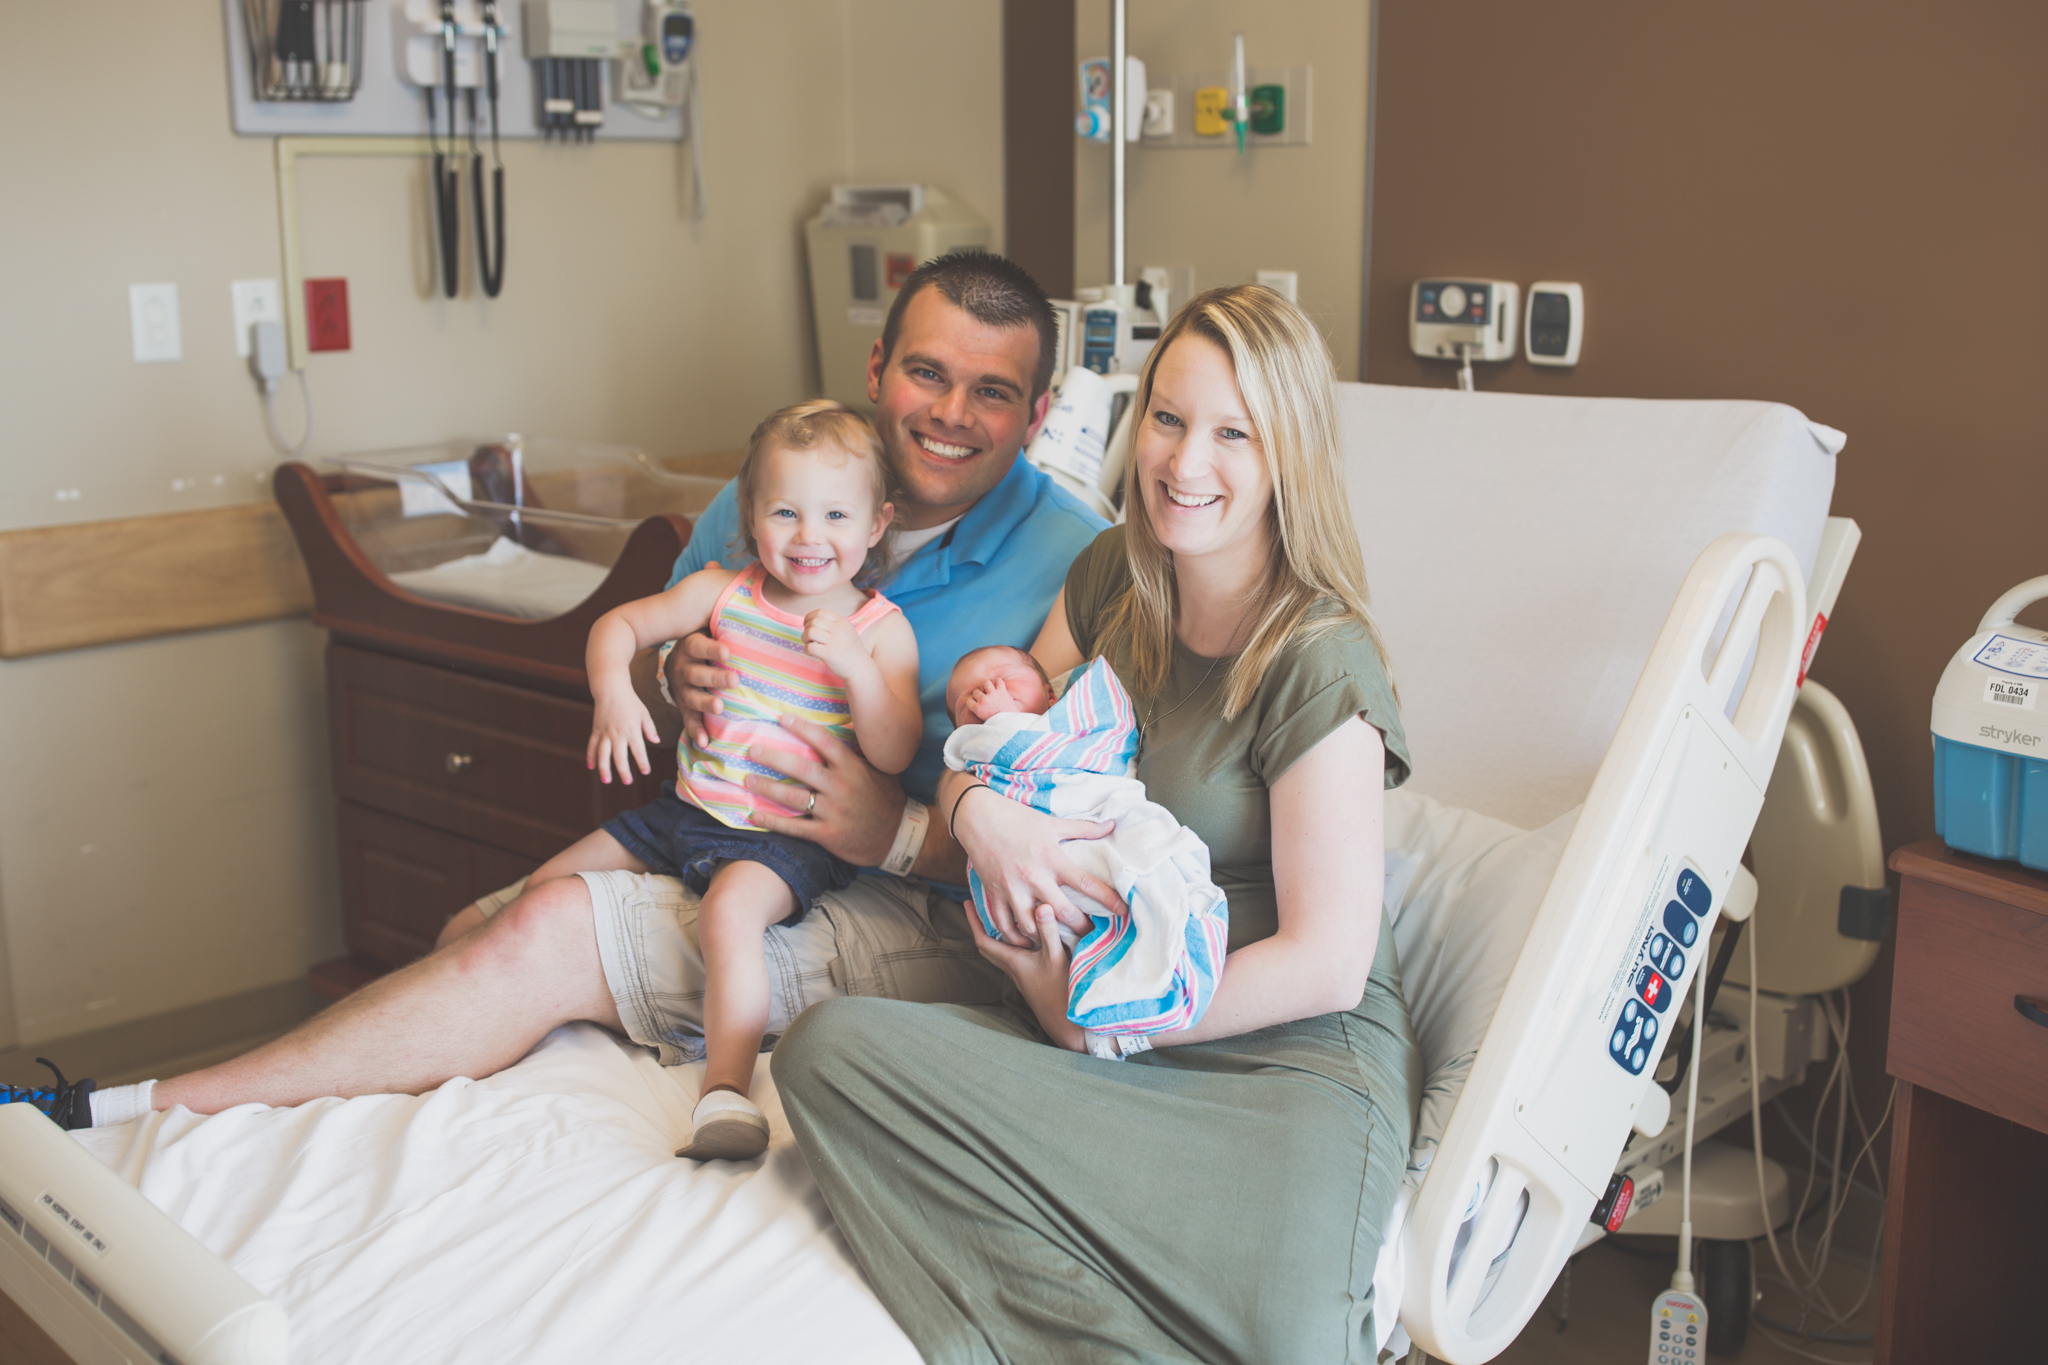 Newborn lifestyle home hospital fresh 48 studio Session Cara Peterson Photography Rockford IL-2.jpg